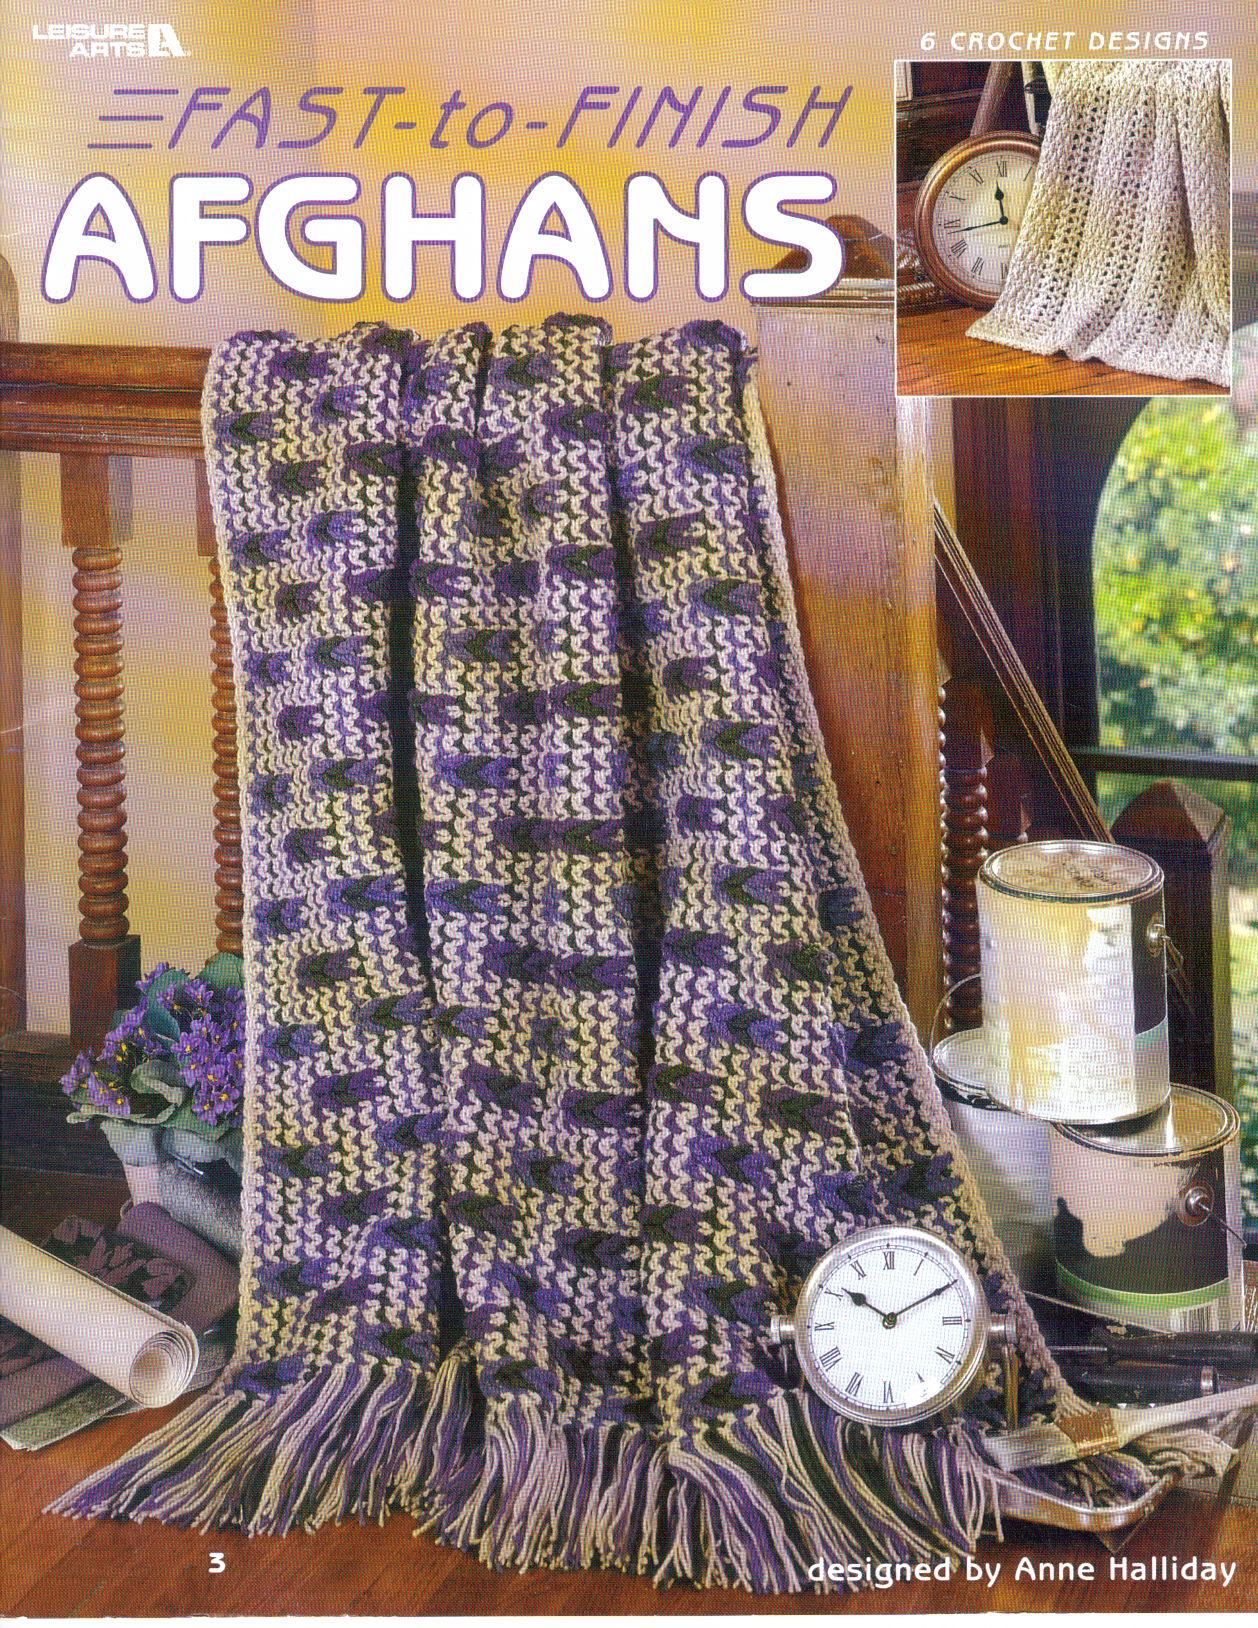 6 crochet designs~